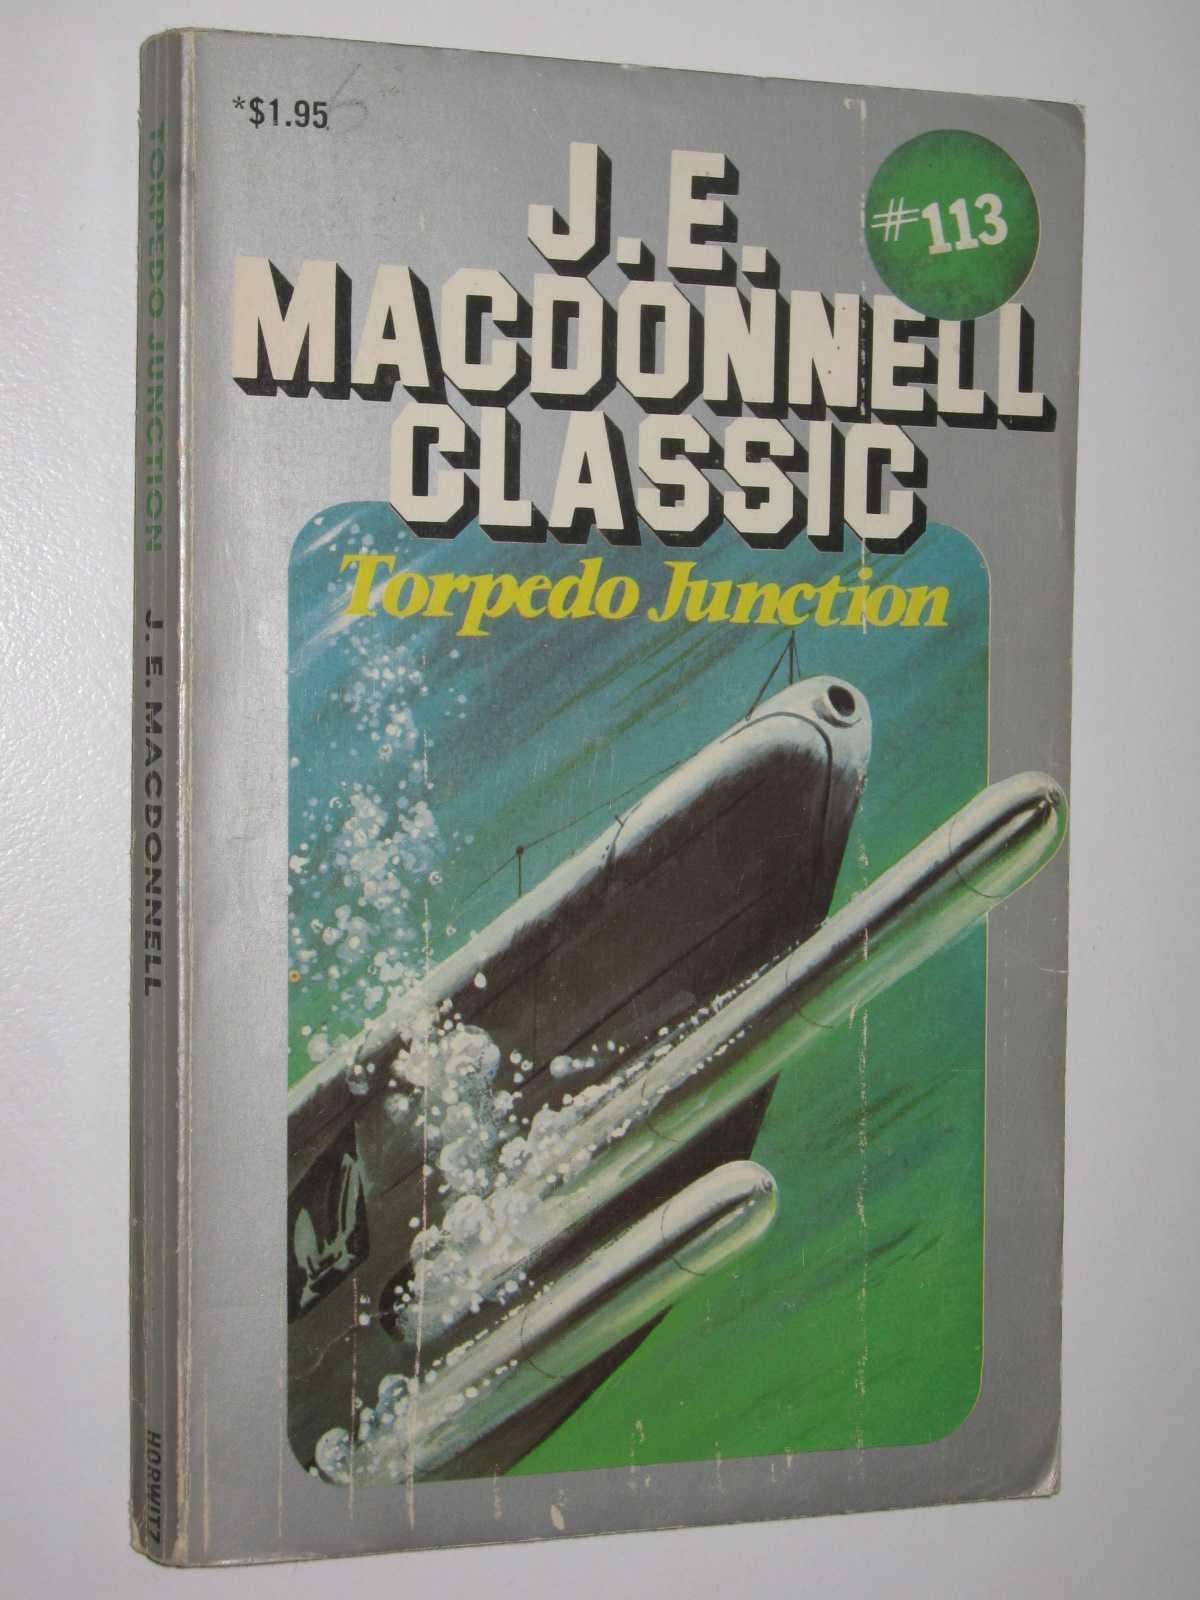 Torpedo Junction - Classic Series #113, Macdonnell, J. E.